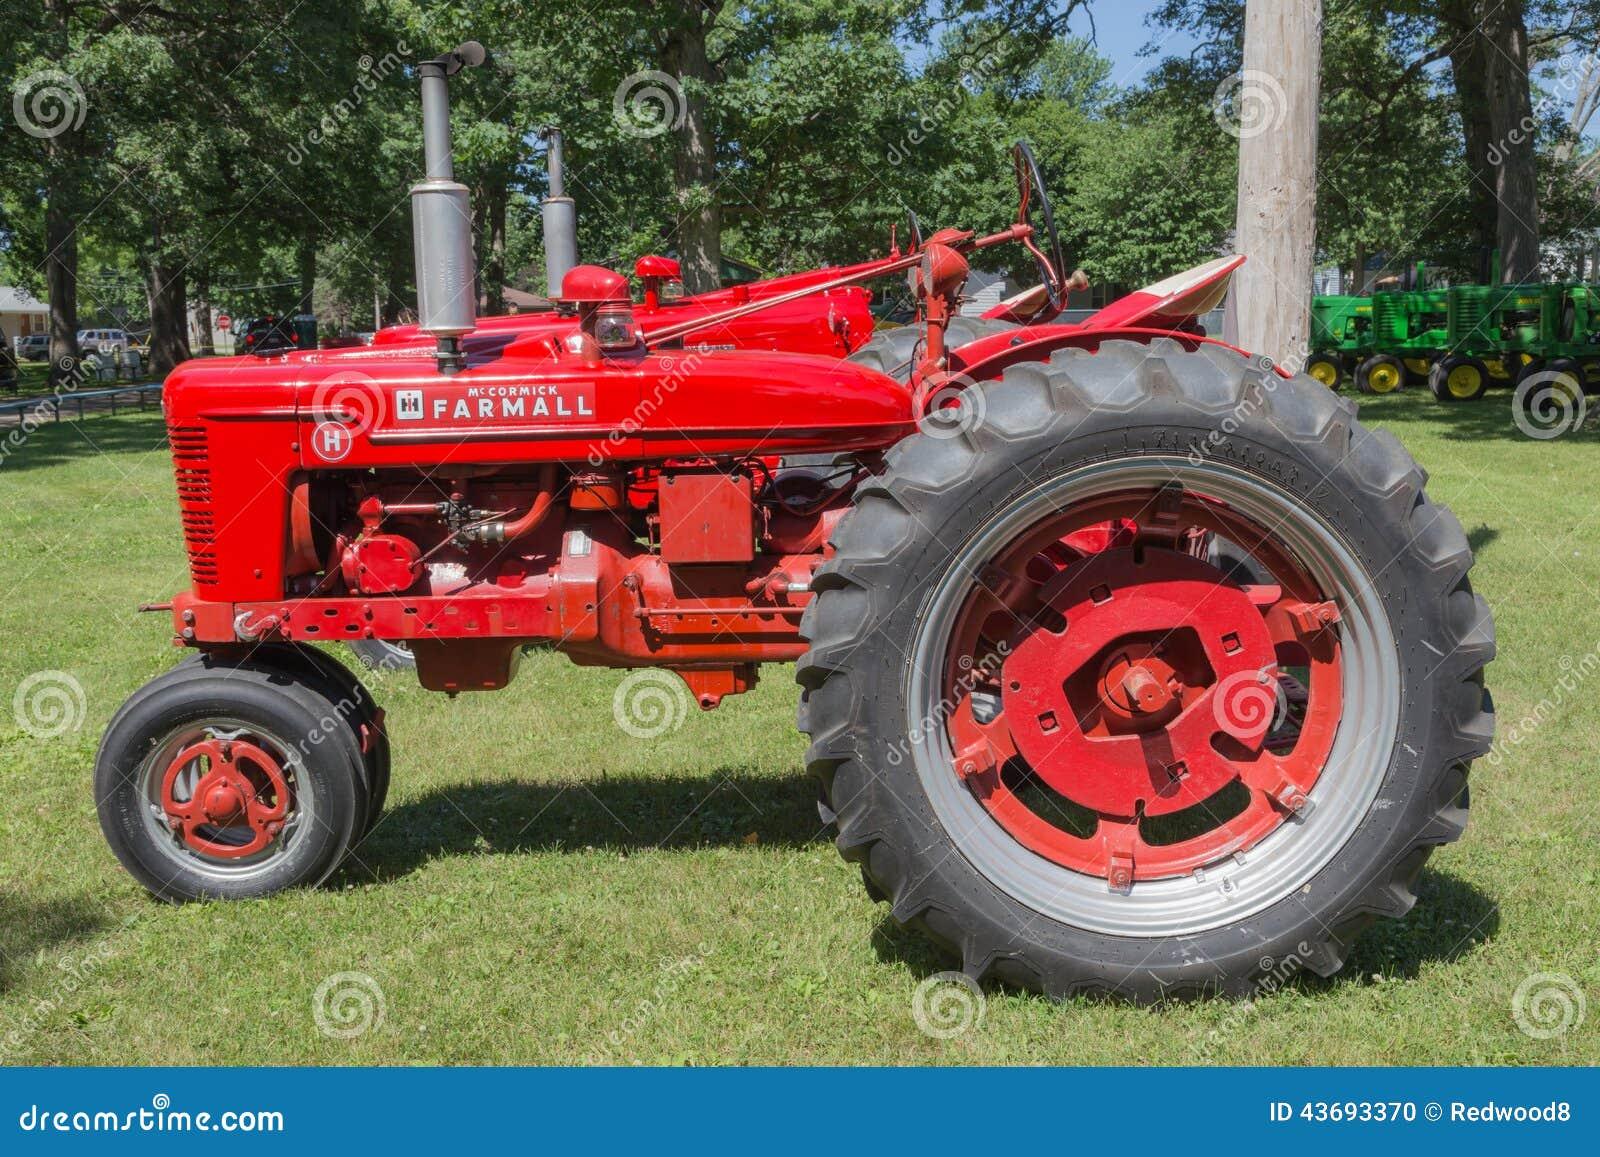 Farmall Tractor Models : Farmall model h editorial image